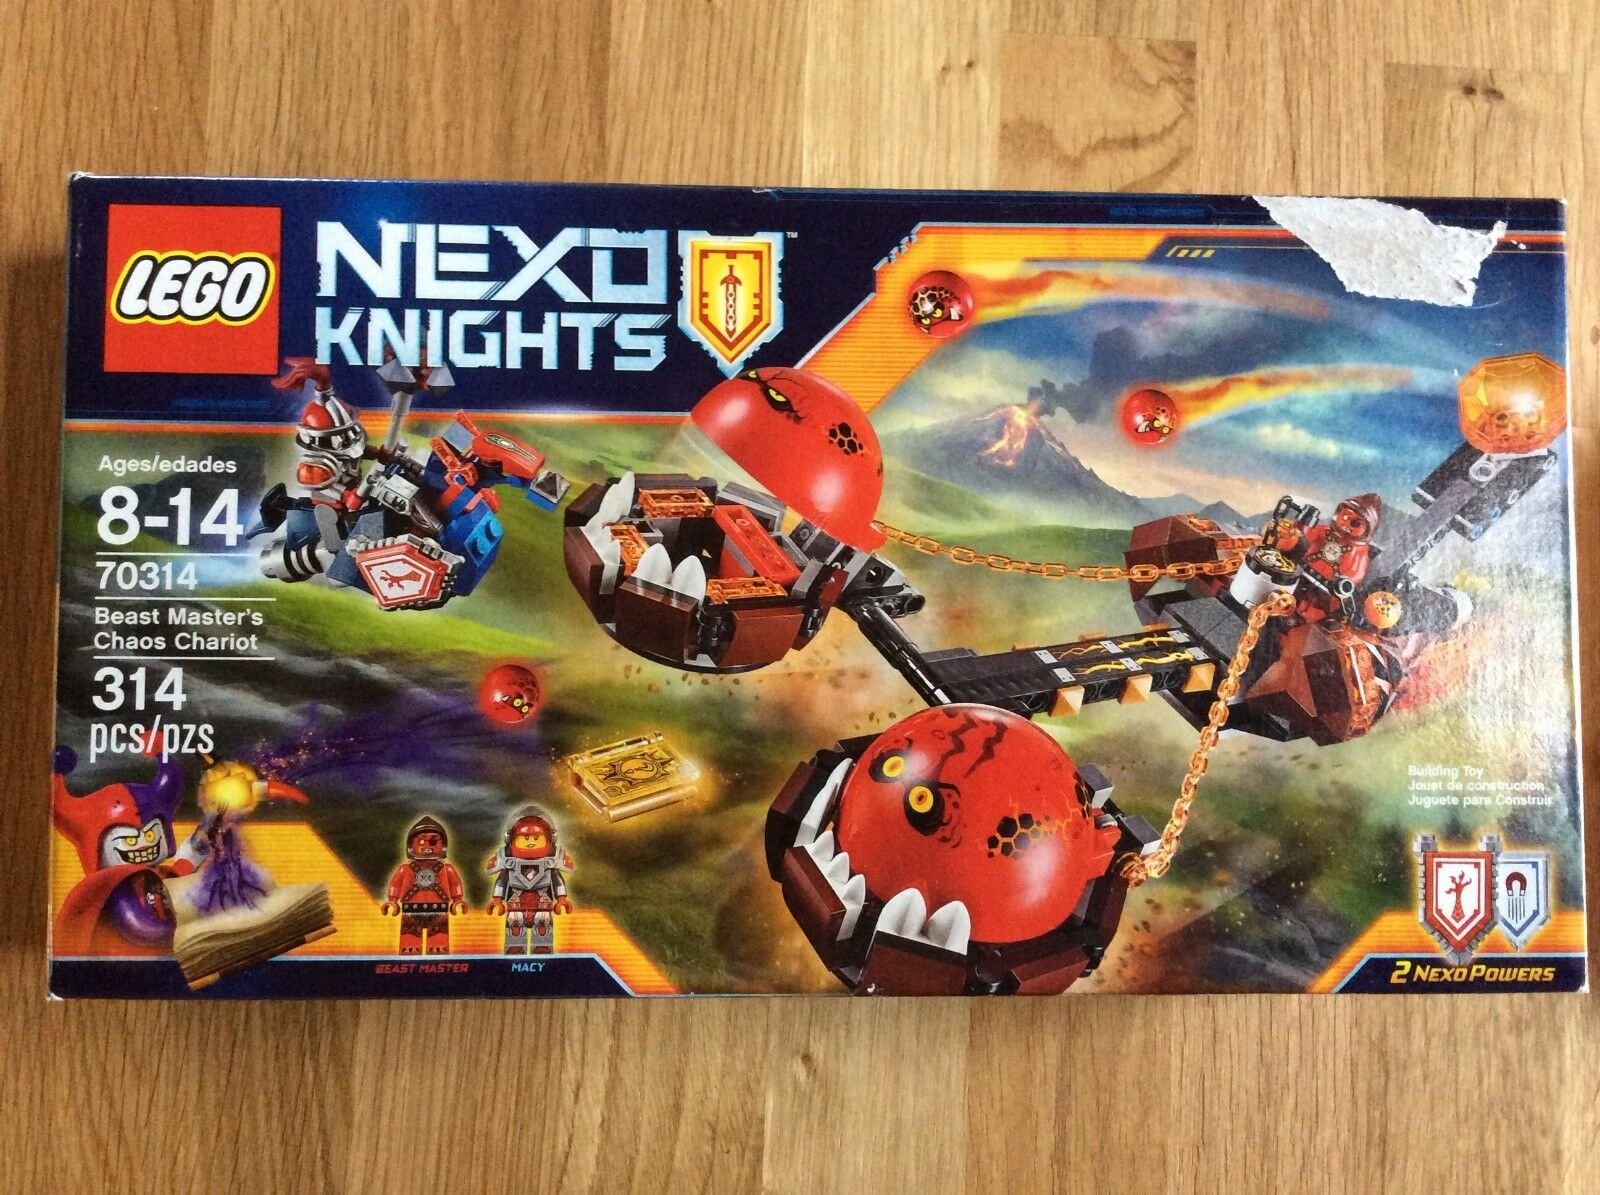 New Lego Nexo Knights set 70314 Beast Master's Chariot Damaged Box